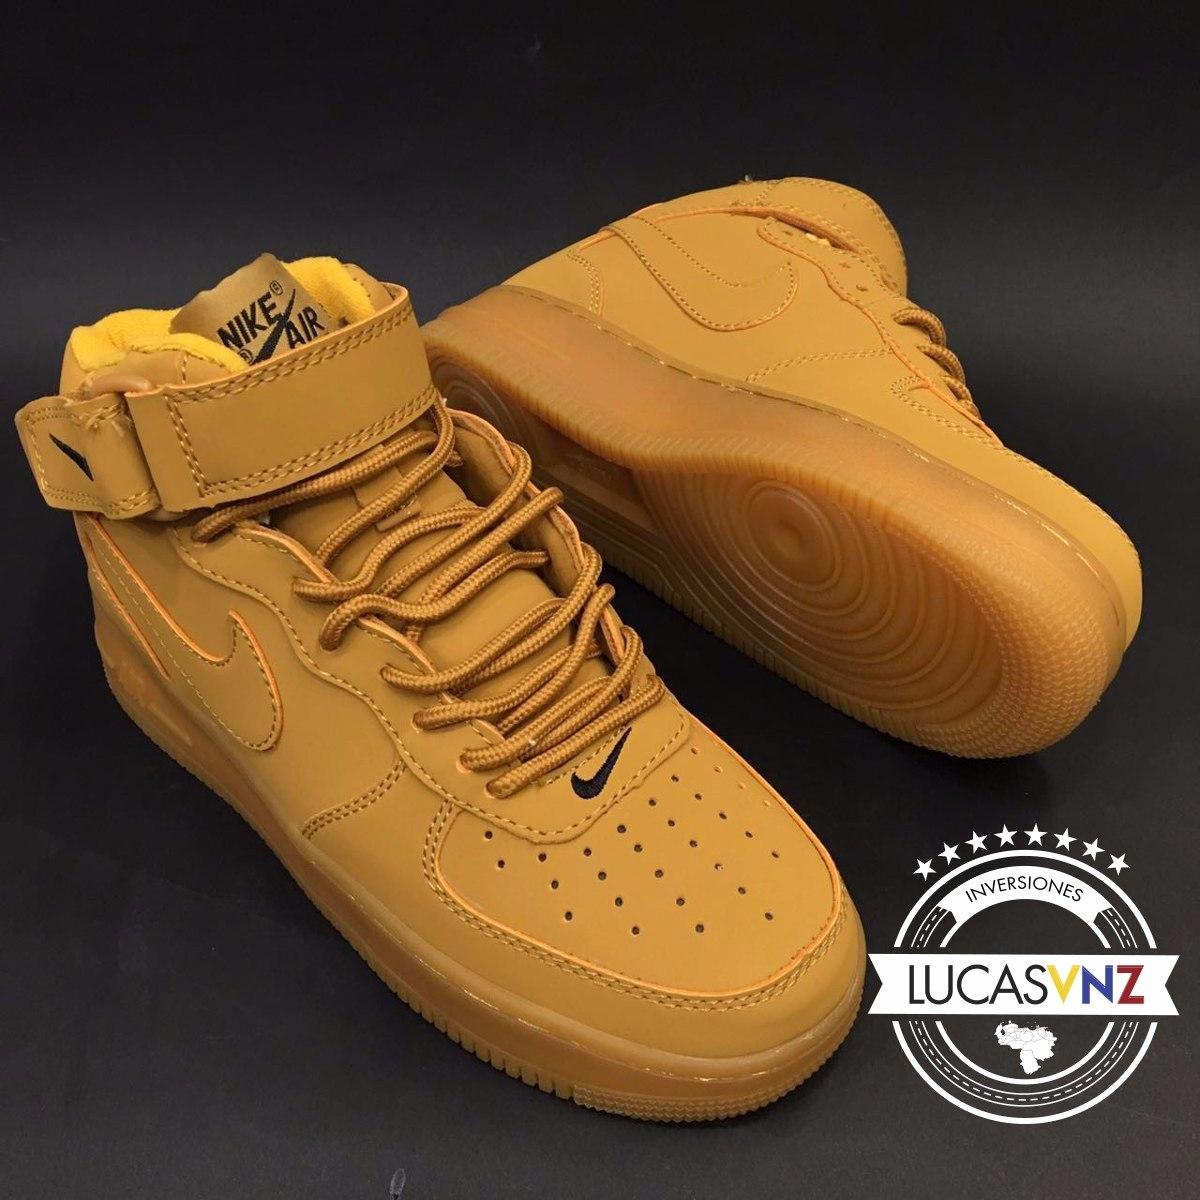 Corte Botas 35 Force Zapatos Nike 45 Al Bajo One Y Bs 05 Talla 1 8w4qXxq5